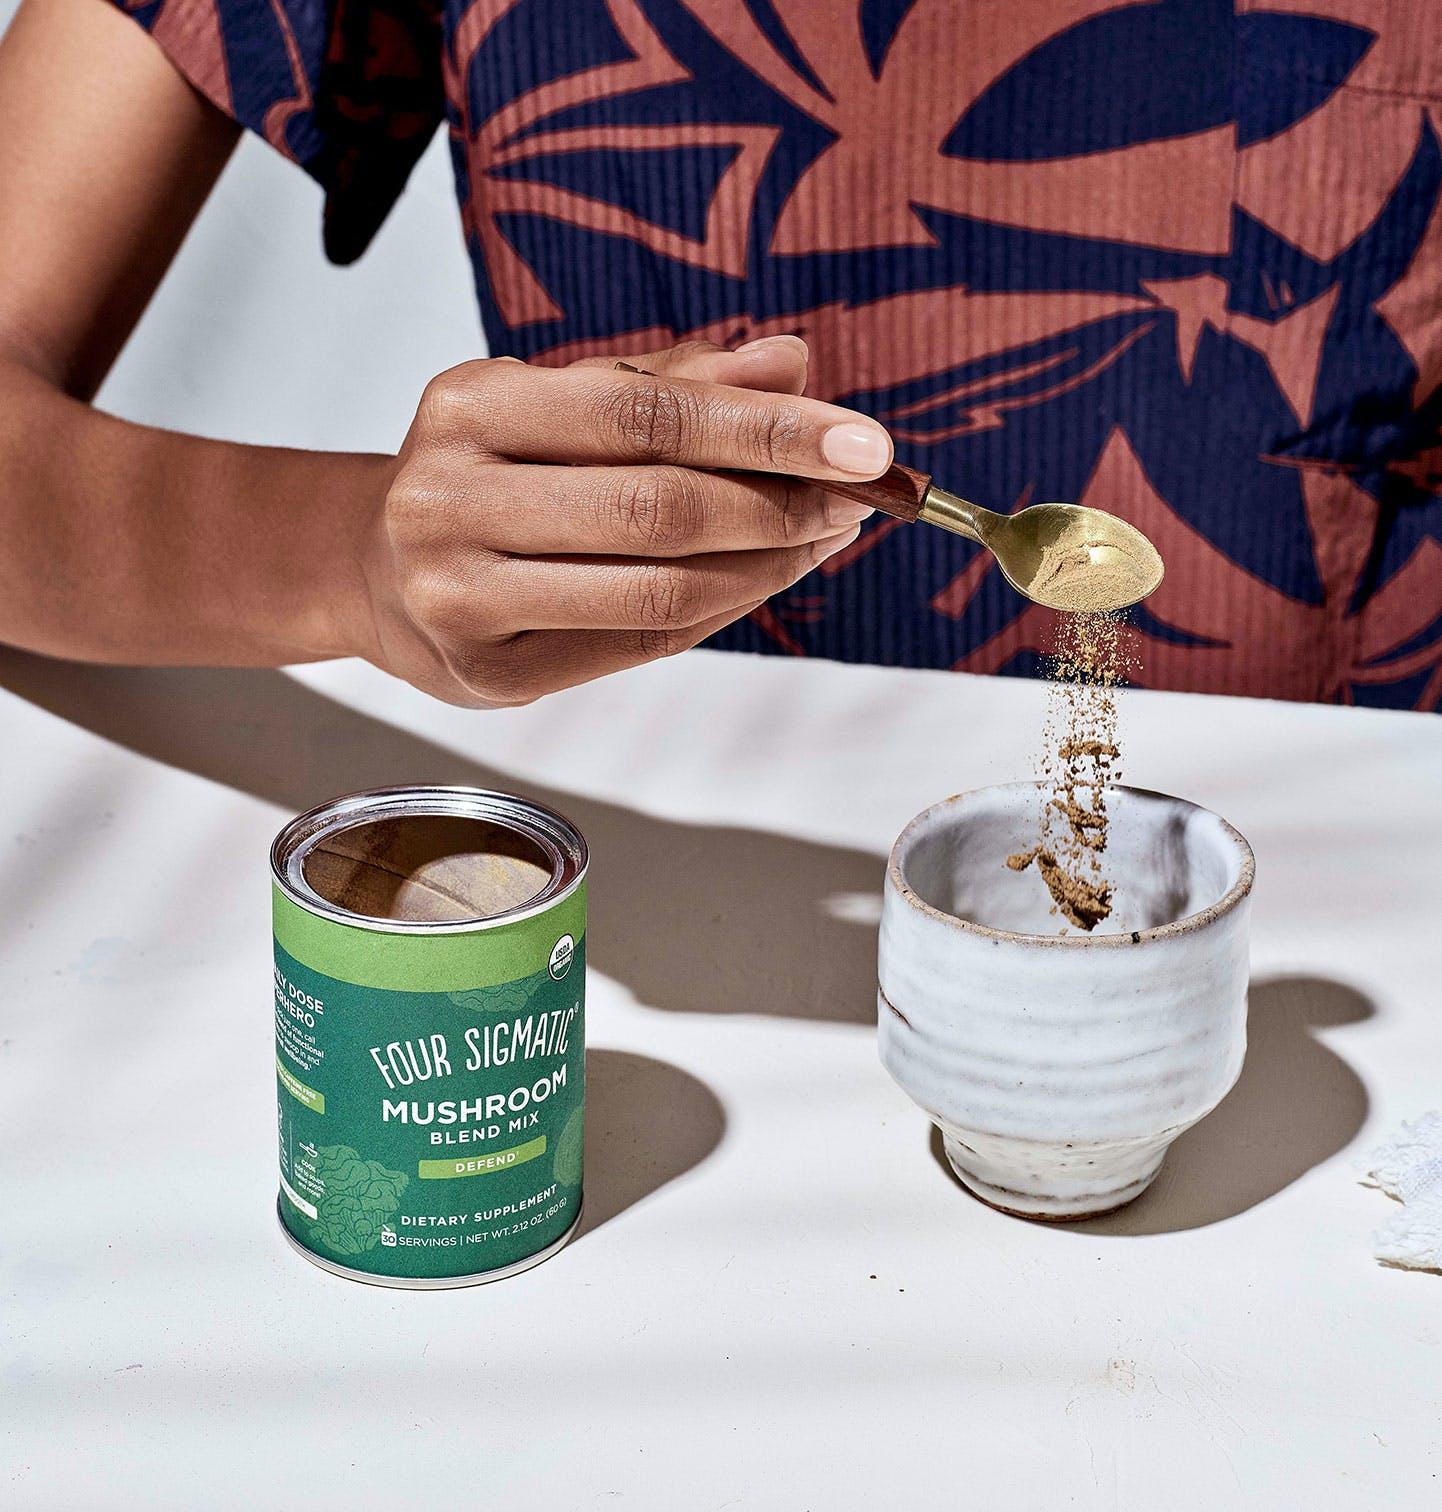 Mushroom Blend Pour